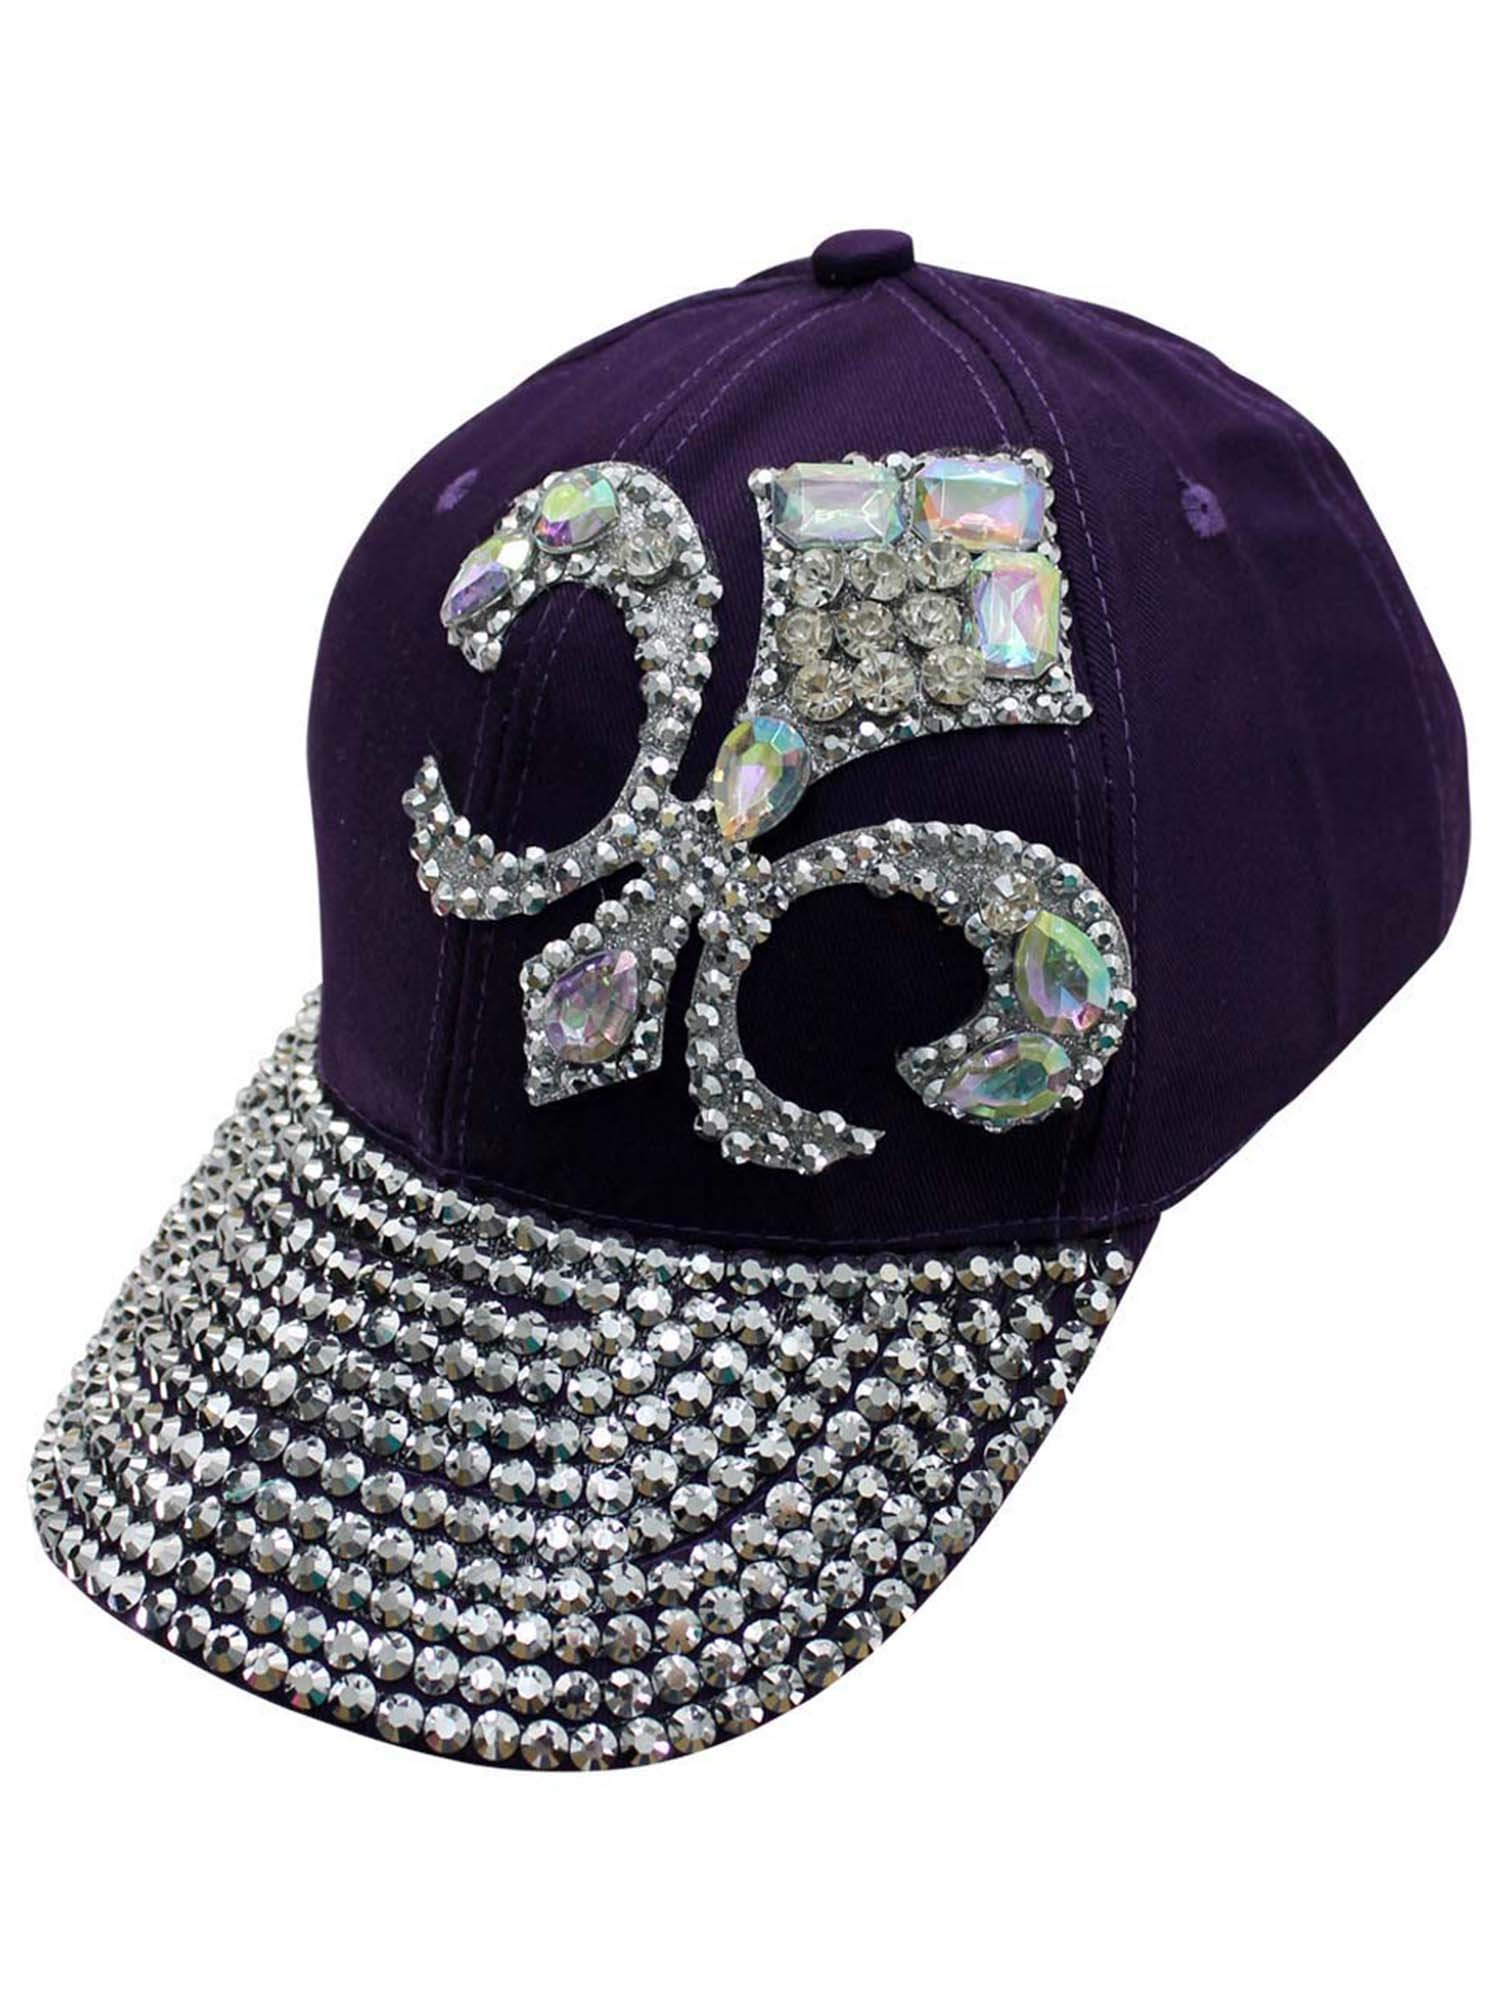 Luxury Divas Purple Baseball Cap with Rhinestone Fleur De Lis by Luxury Divas